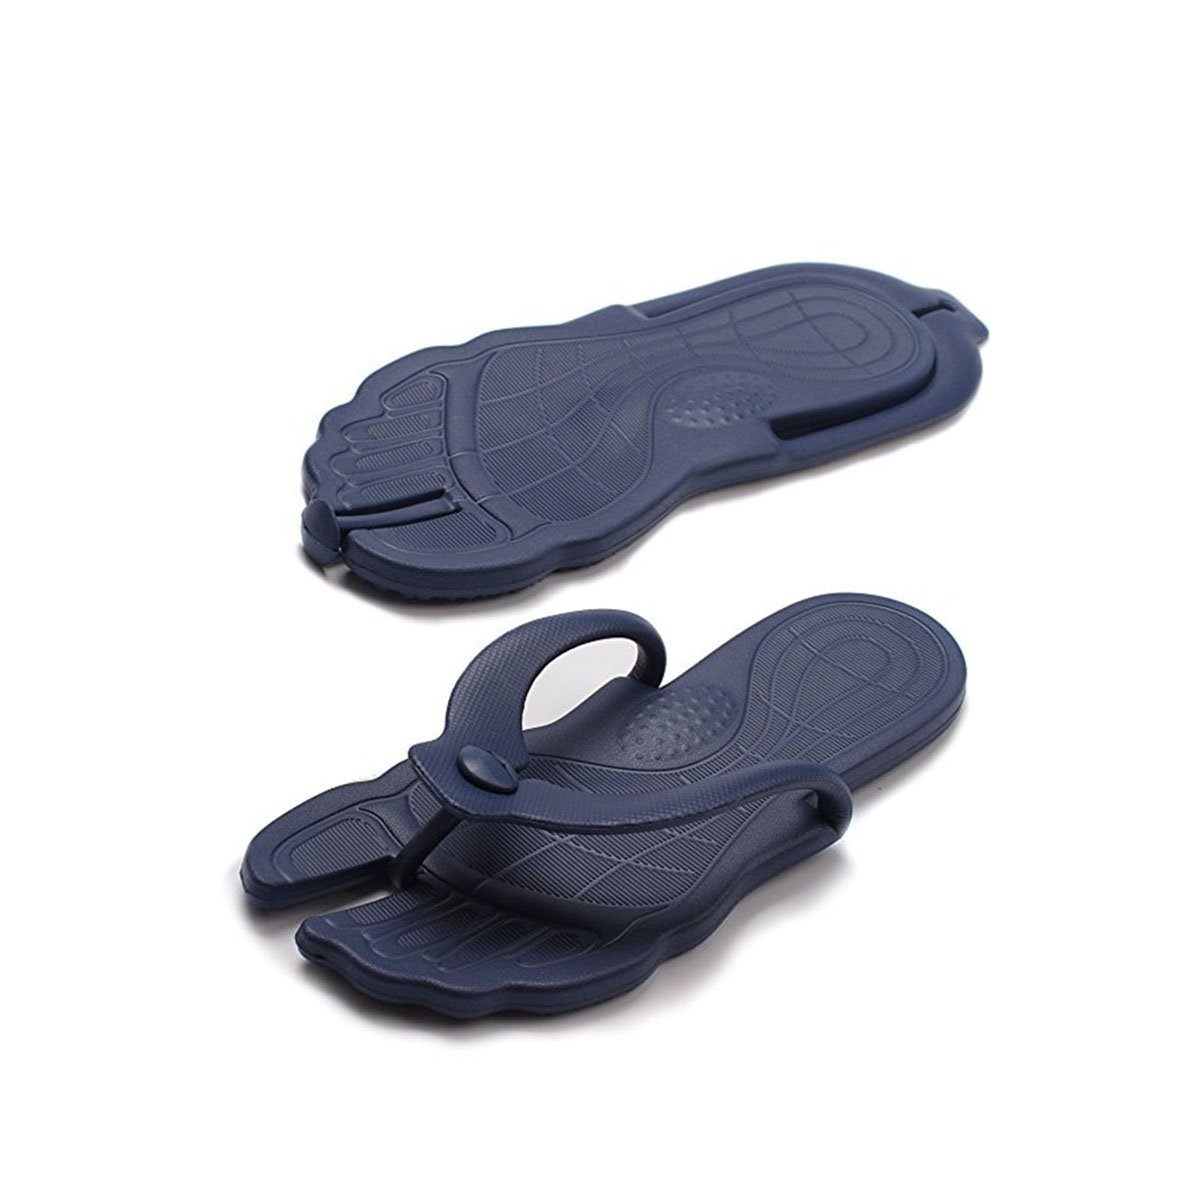 ARSTART Foldable Flip Flops Sandals Mens Womens Travel Beach Slippers Portable Anti-Slip Indoor Outdoor Bathroom Shoes